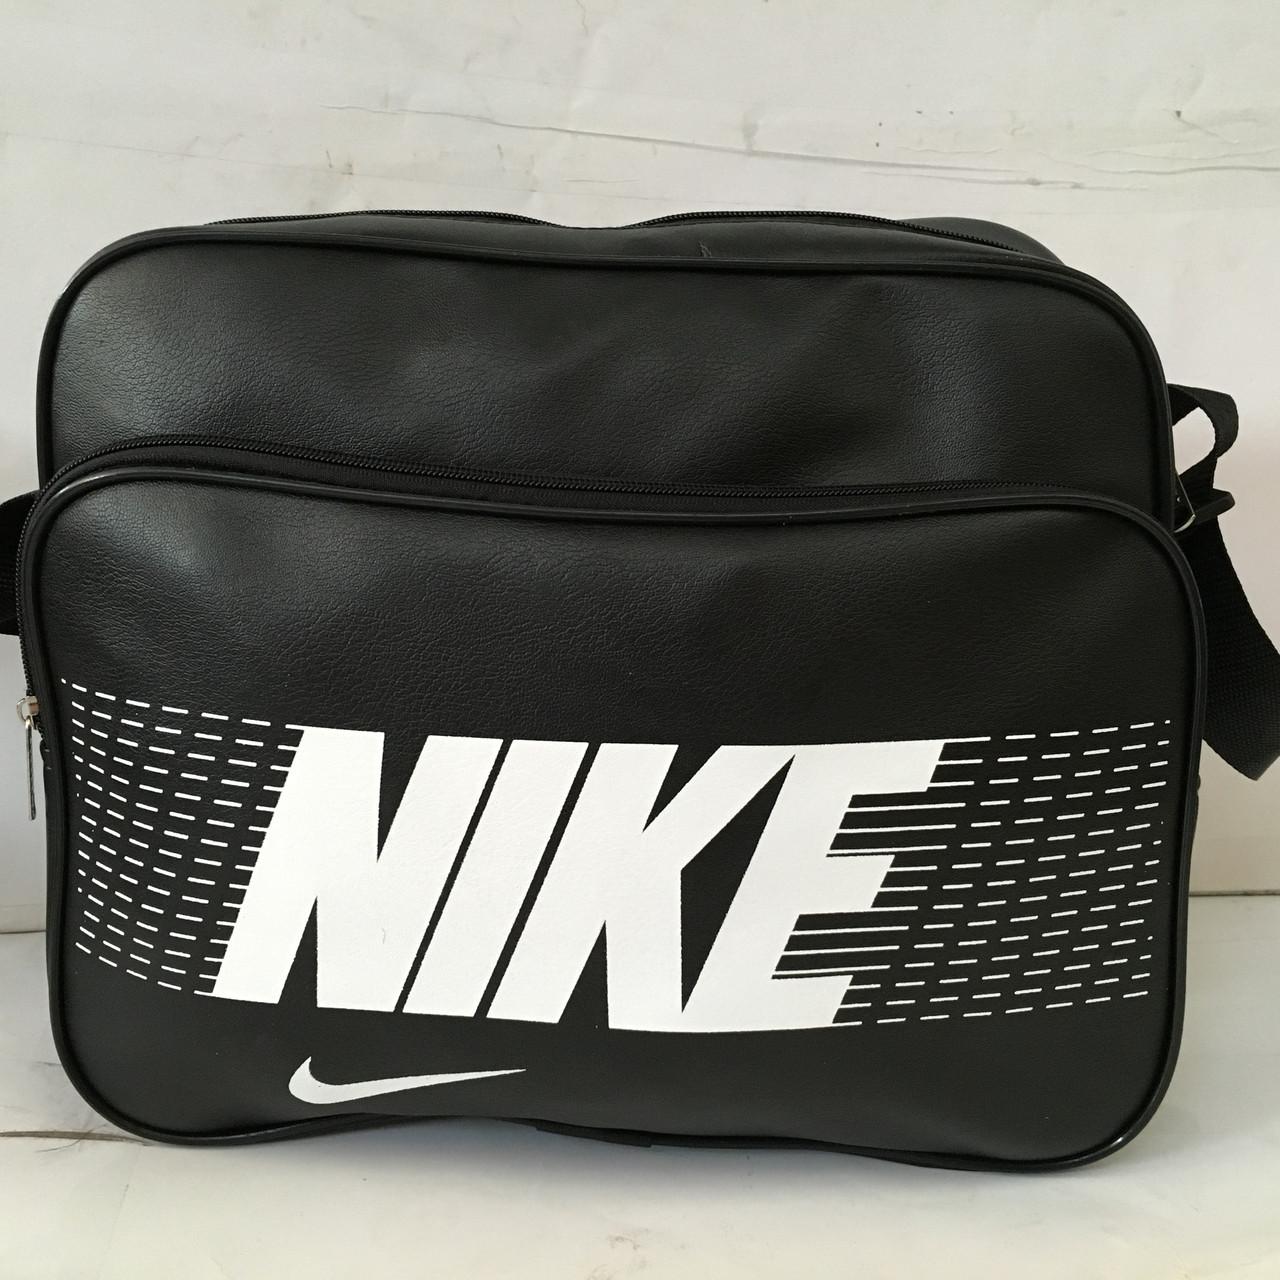 9c6becdb29180 Спортивная сумка Nike через плечо формат а4 черная оптом : продажа ...